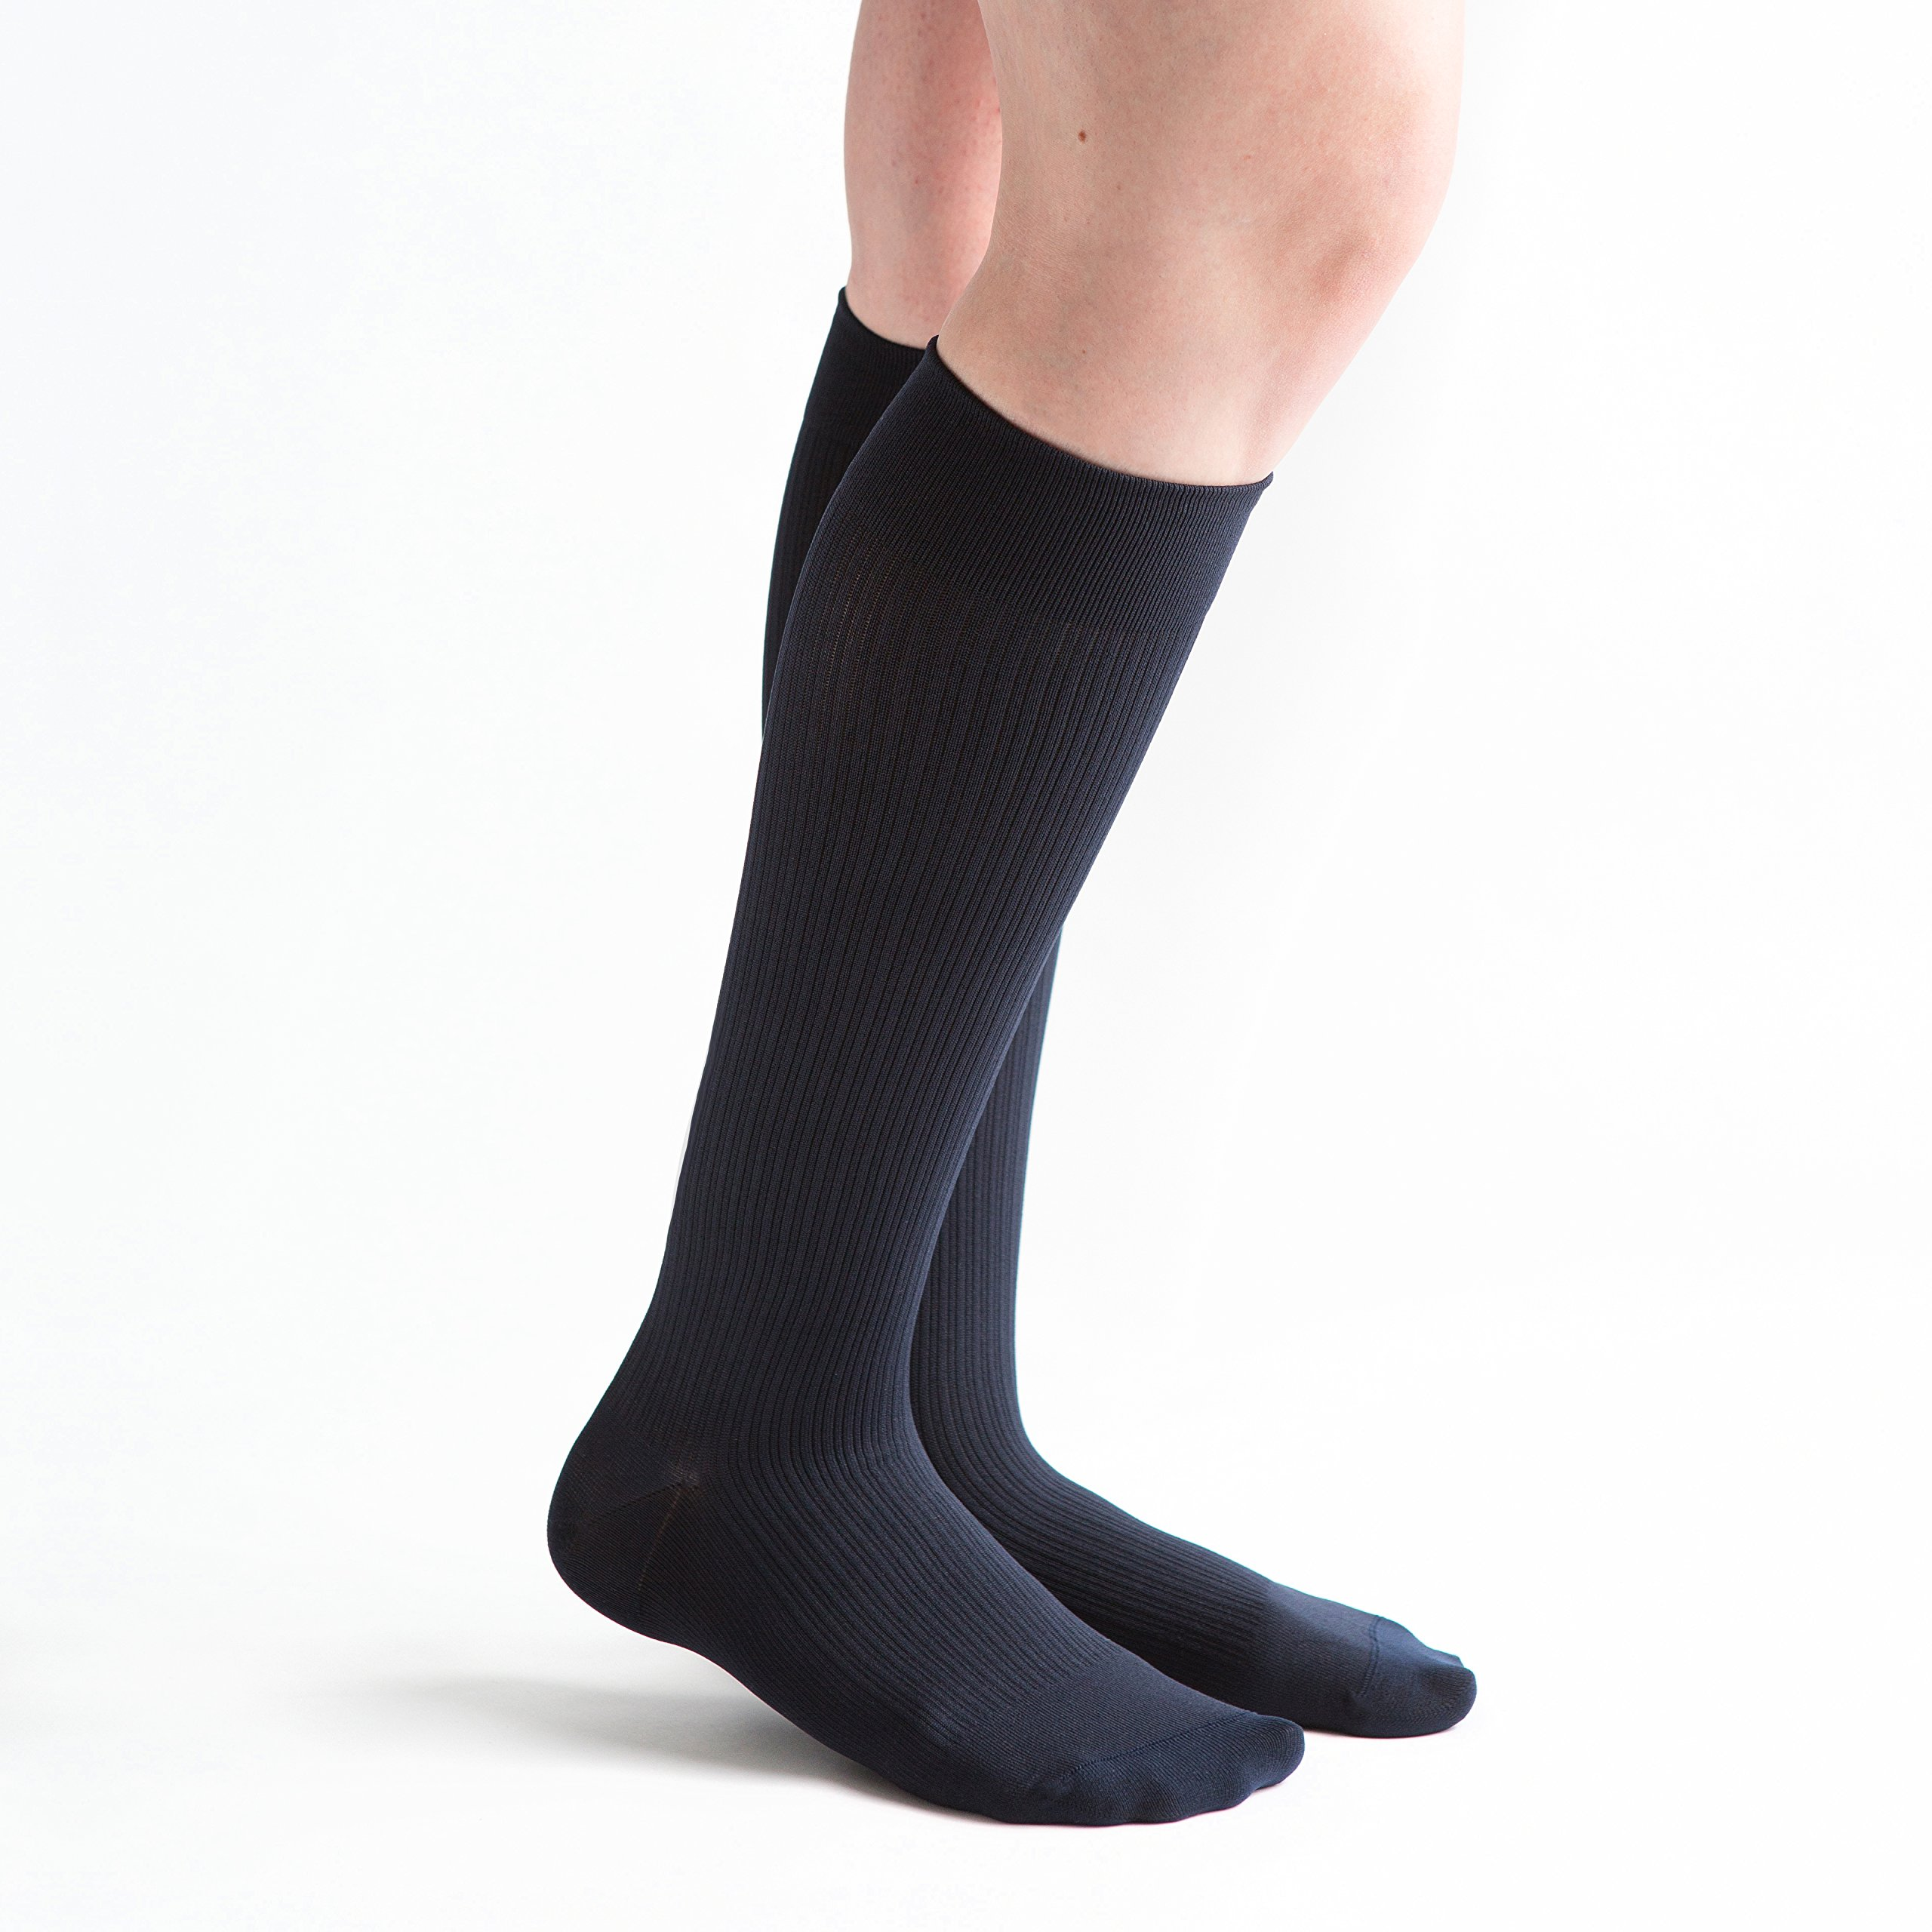 VenActive Women's Ribbed Trouser 20-30 mmHg Compression Socks by VenActive